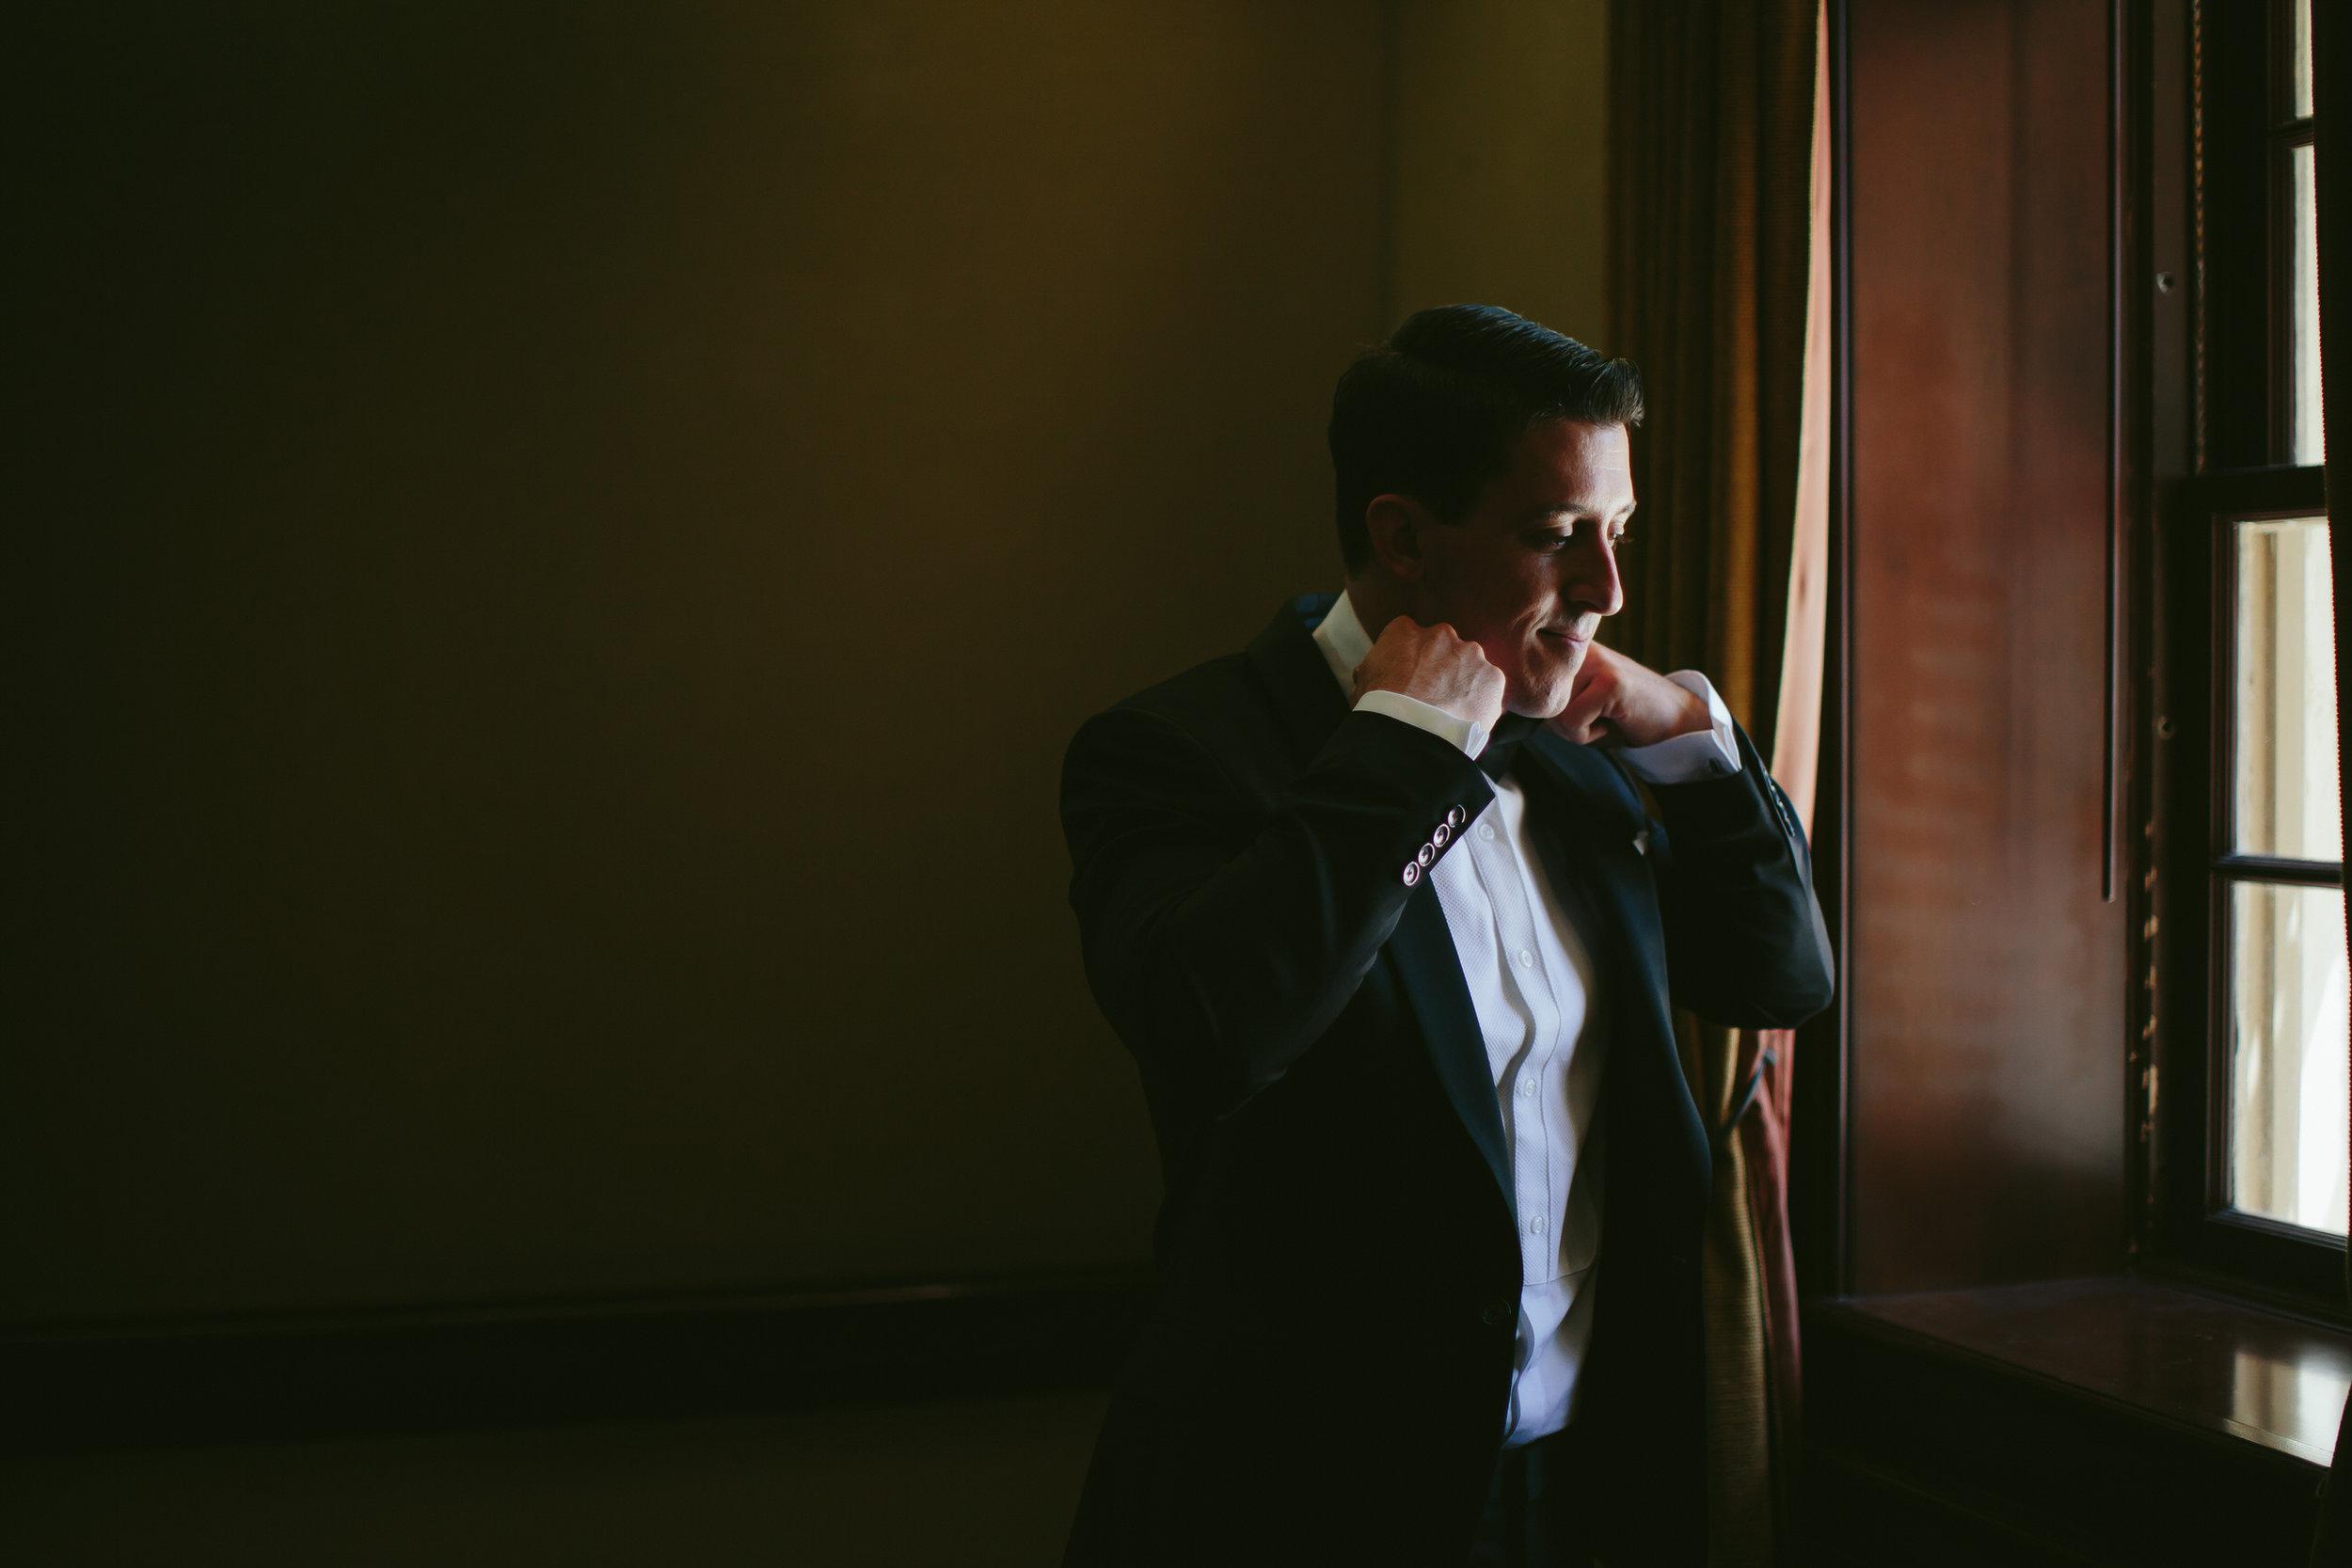 biltmore-wedding-groom-getting-ready-steph-lynn-photo-miami-17.jpg